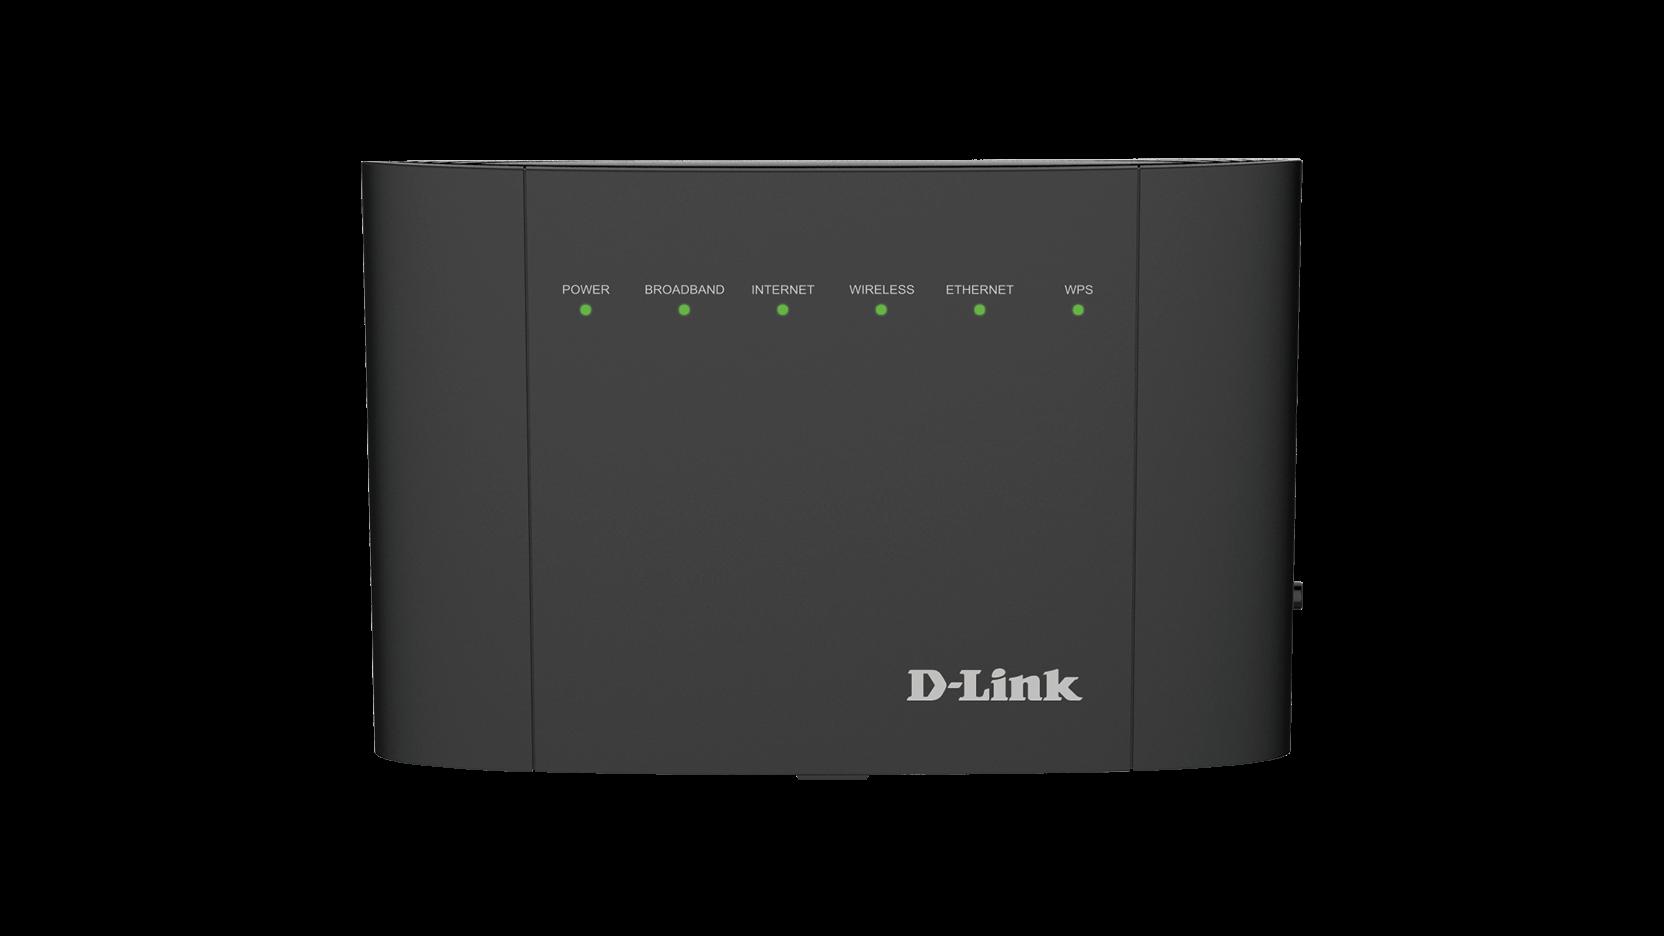 Schema Collegamento Ethernet : Modem router vdsl adsl wifi 1200 mbps dual band d link italia